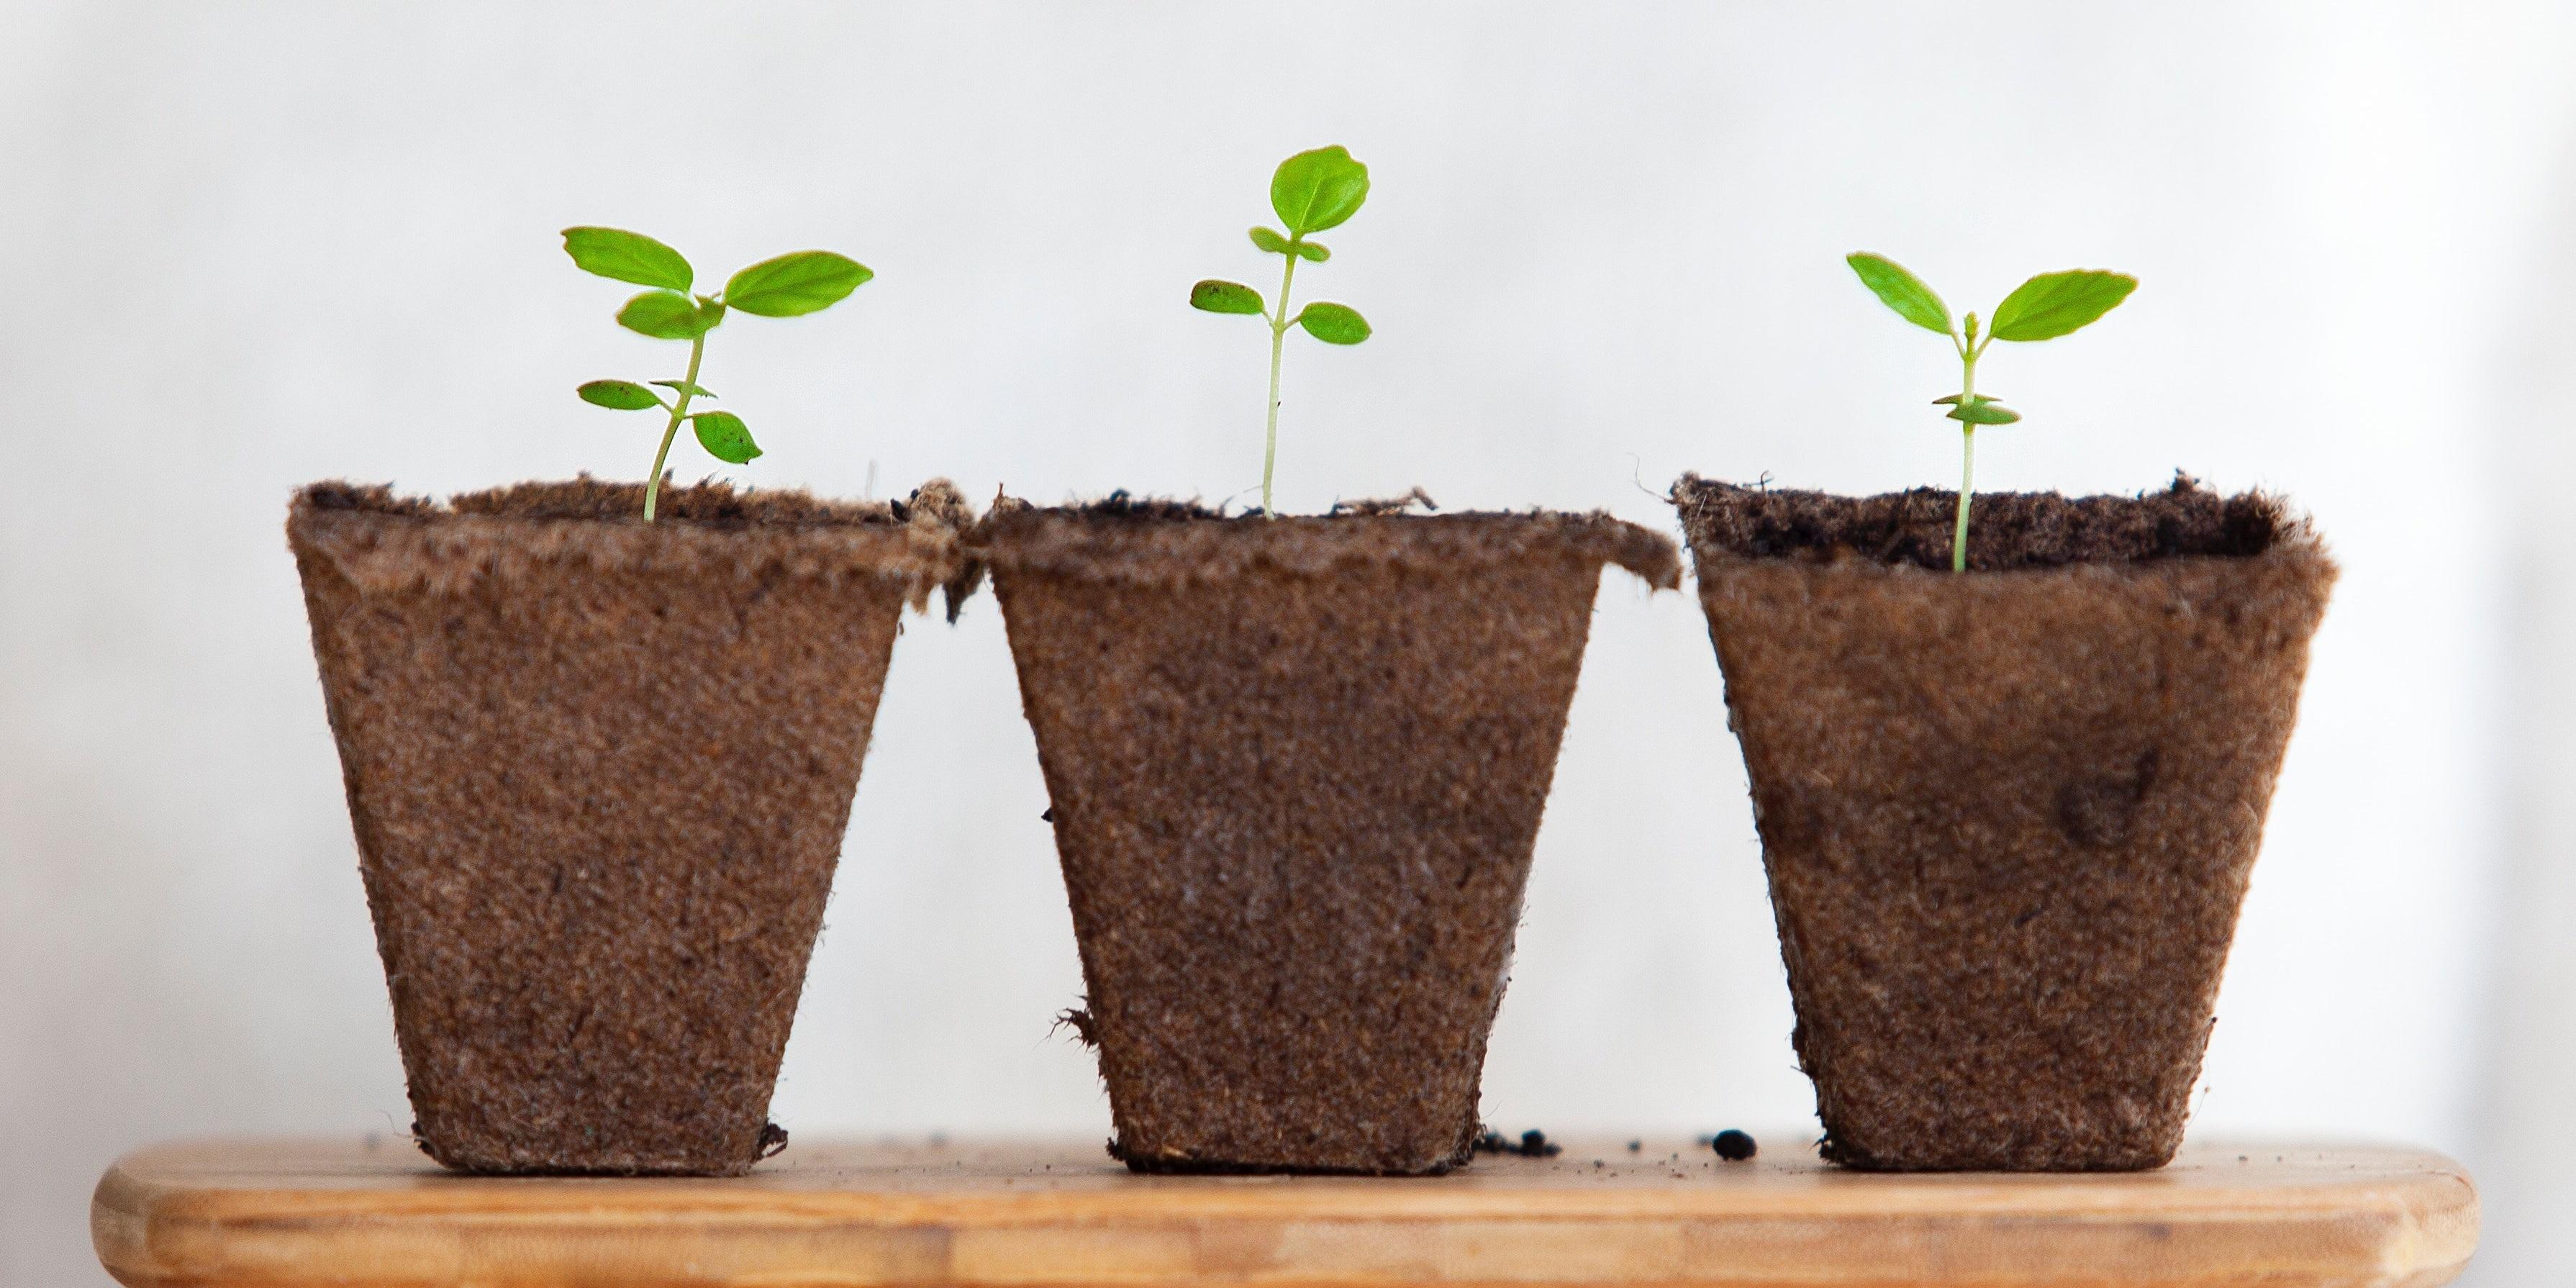 grow-plant-business-652041-edited